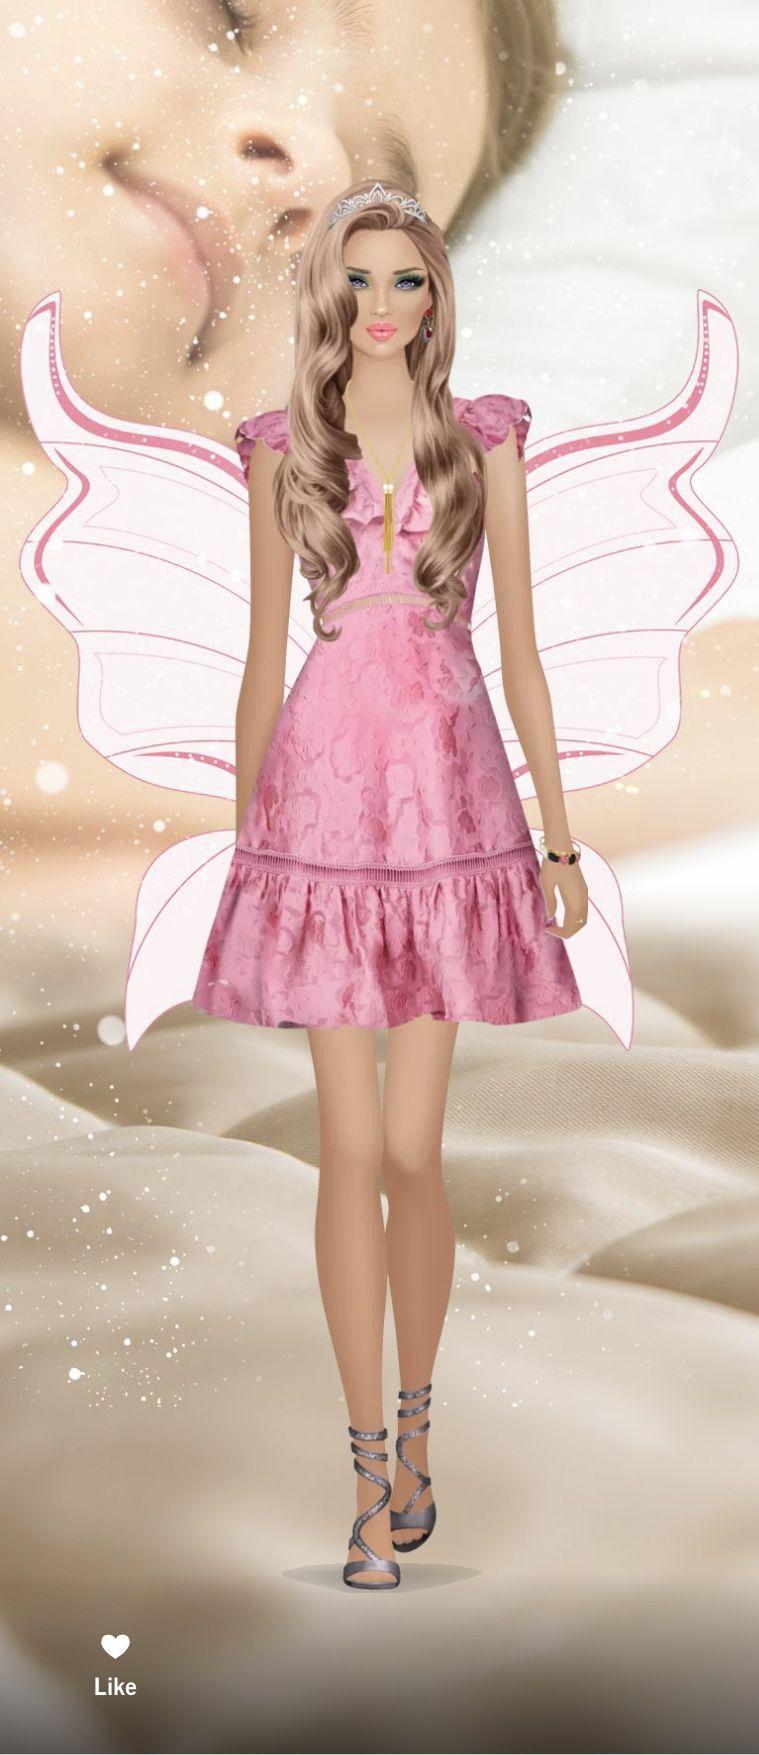 Pin de Brownsugars Sweets en Covet Fashion | Pinterest | Covet ...